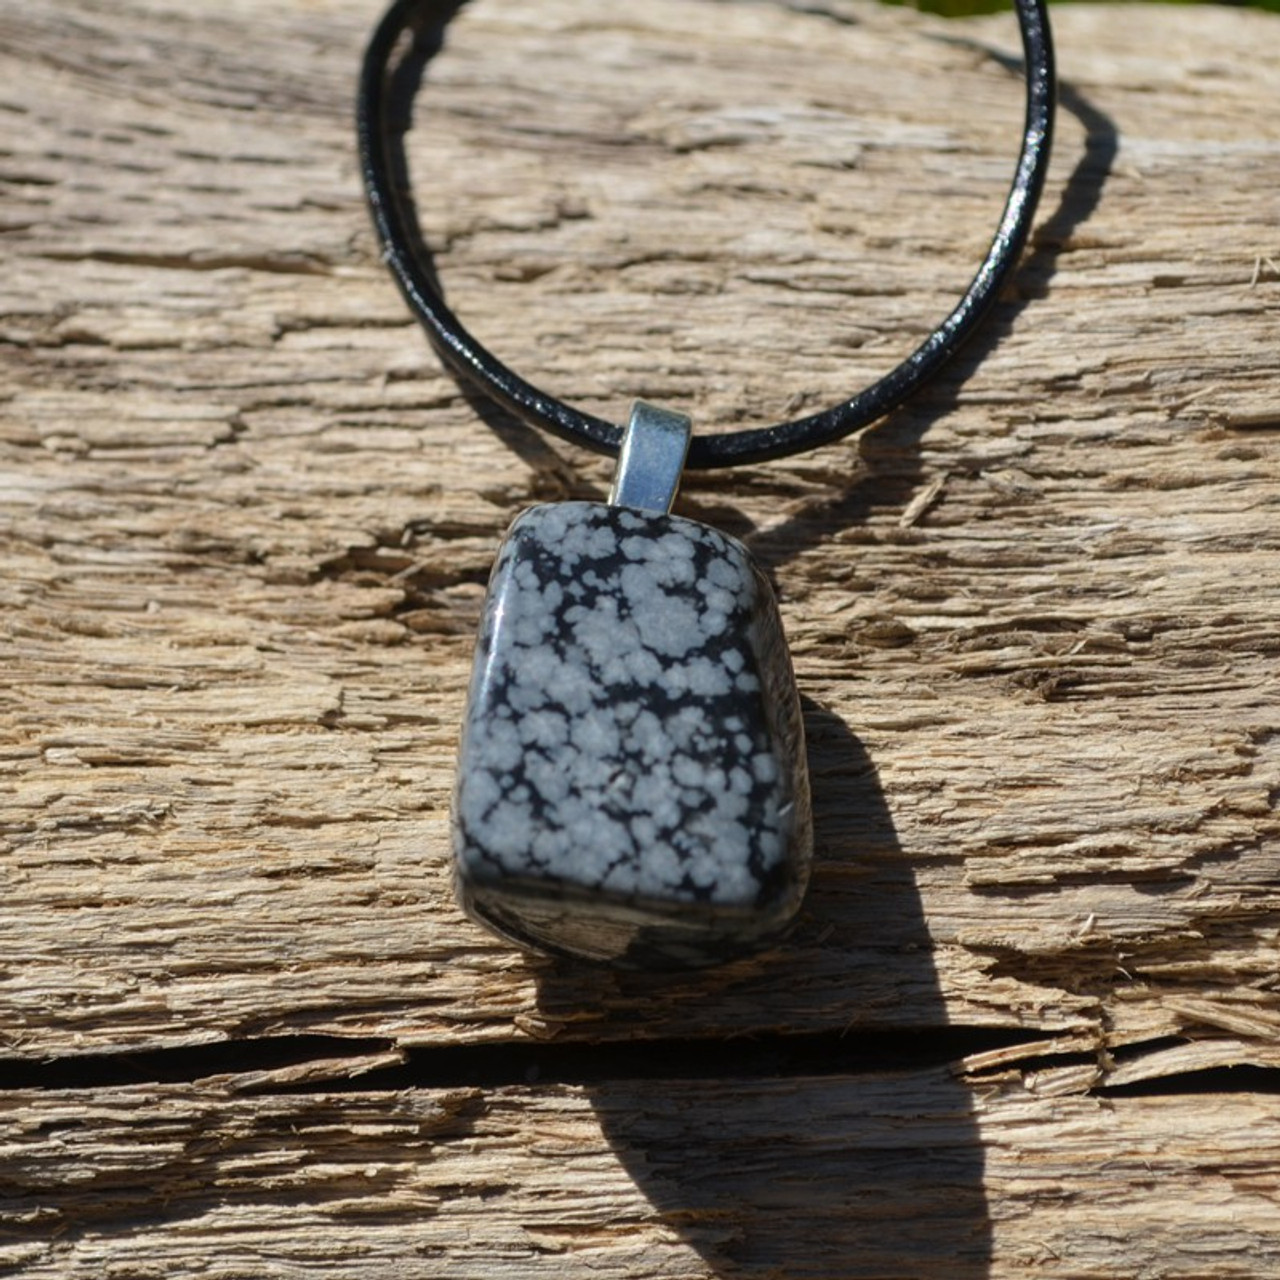 Snowflake Obsidian Stone Necklace